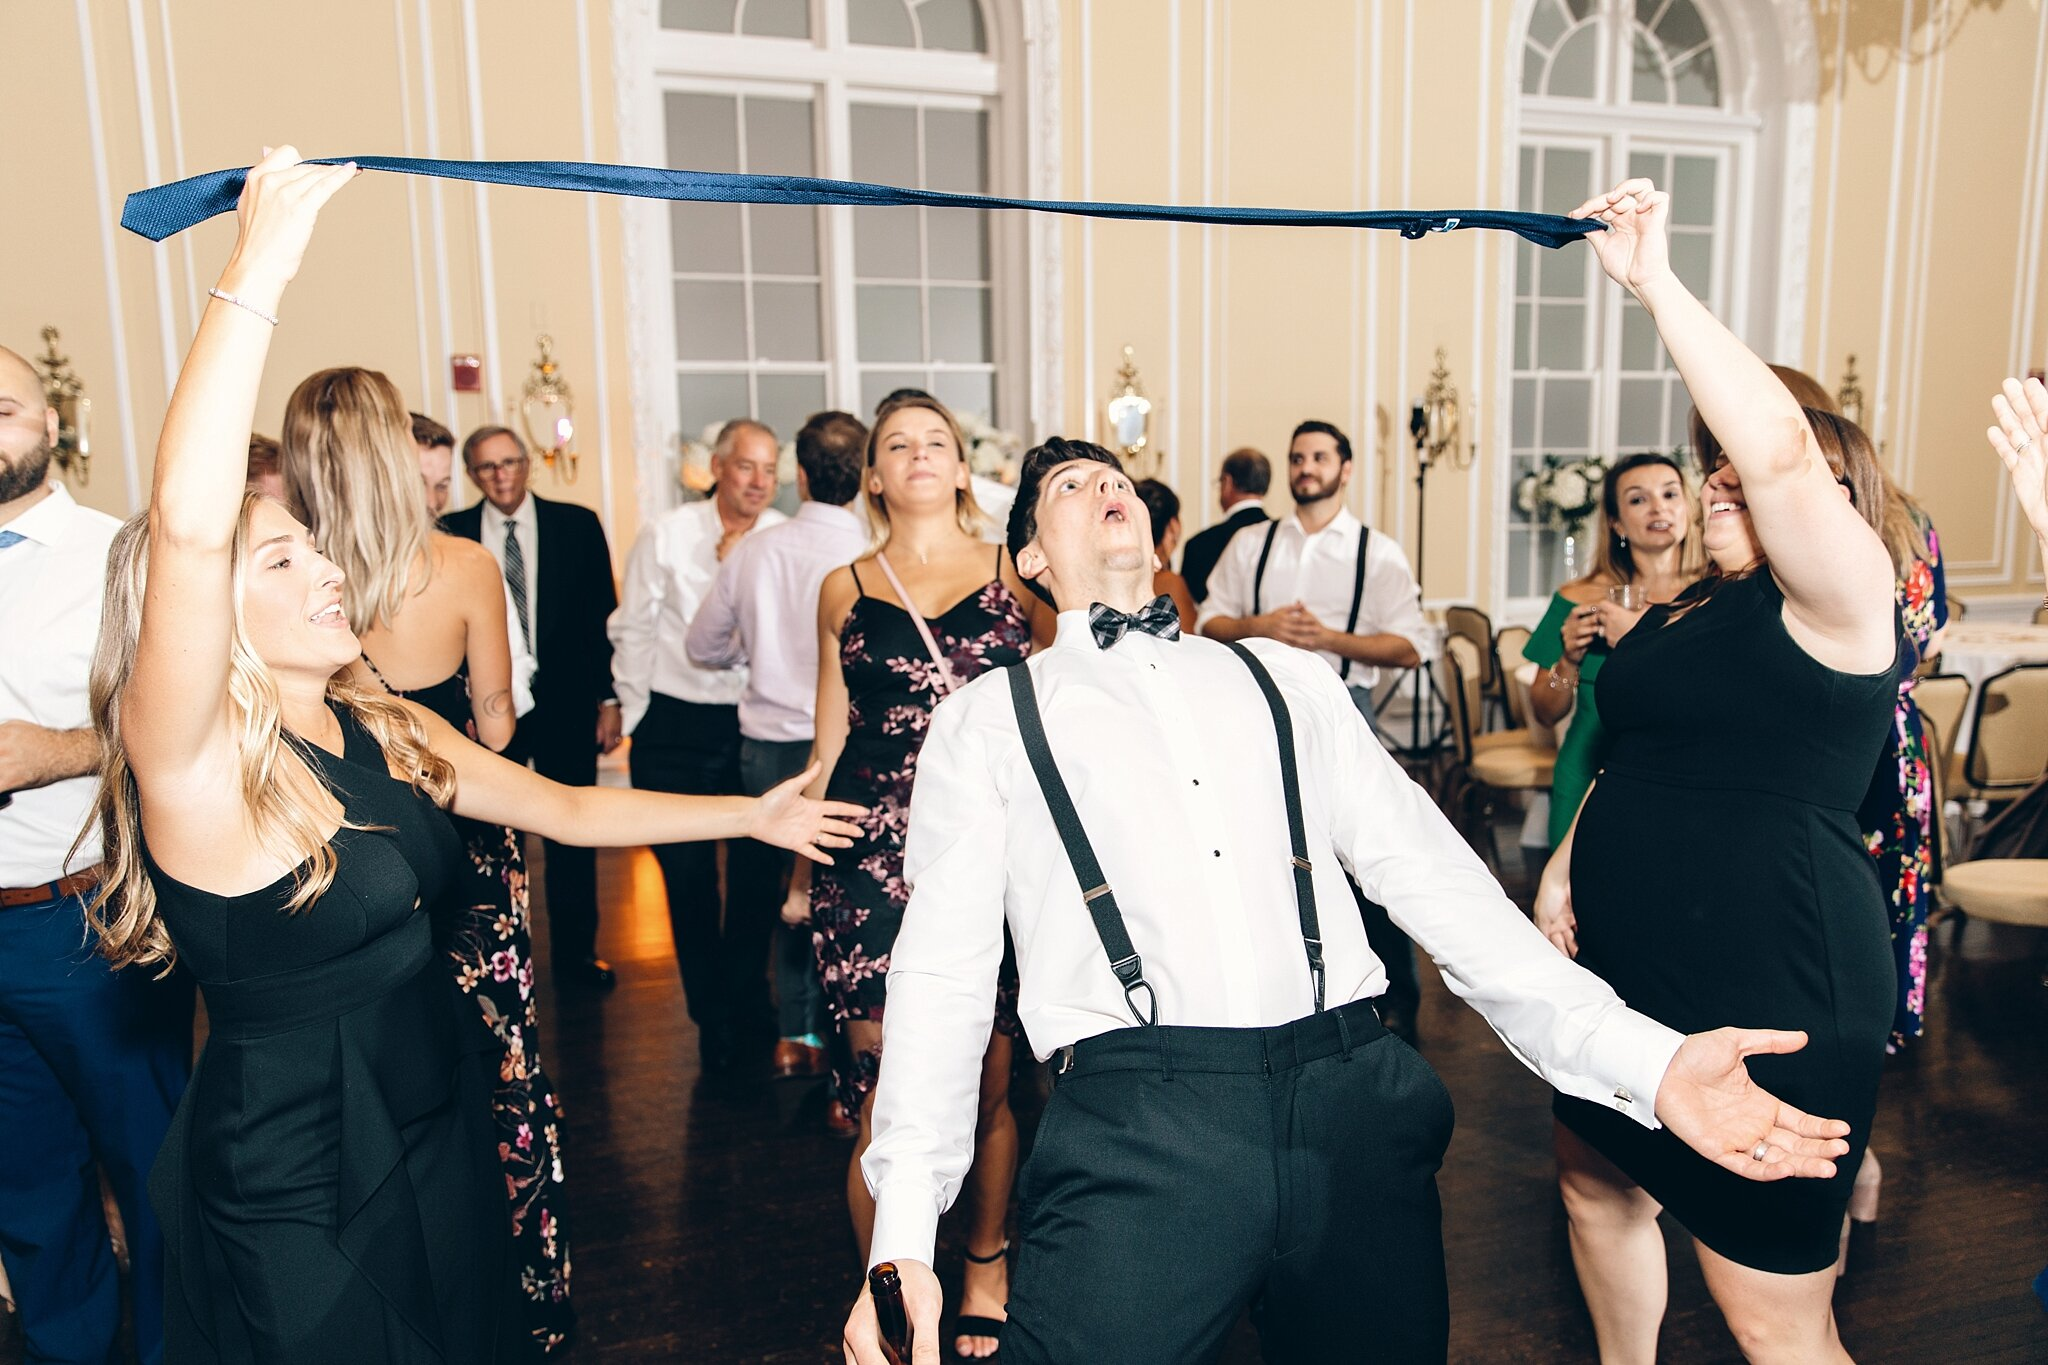 patrick-henry-ballroom-wedding-roanoke_0571.jpg